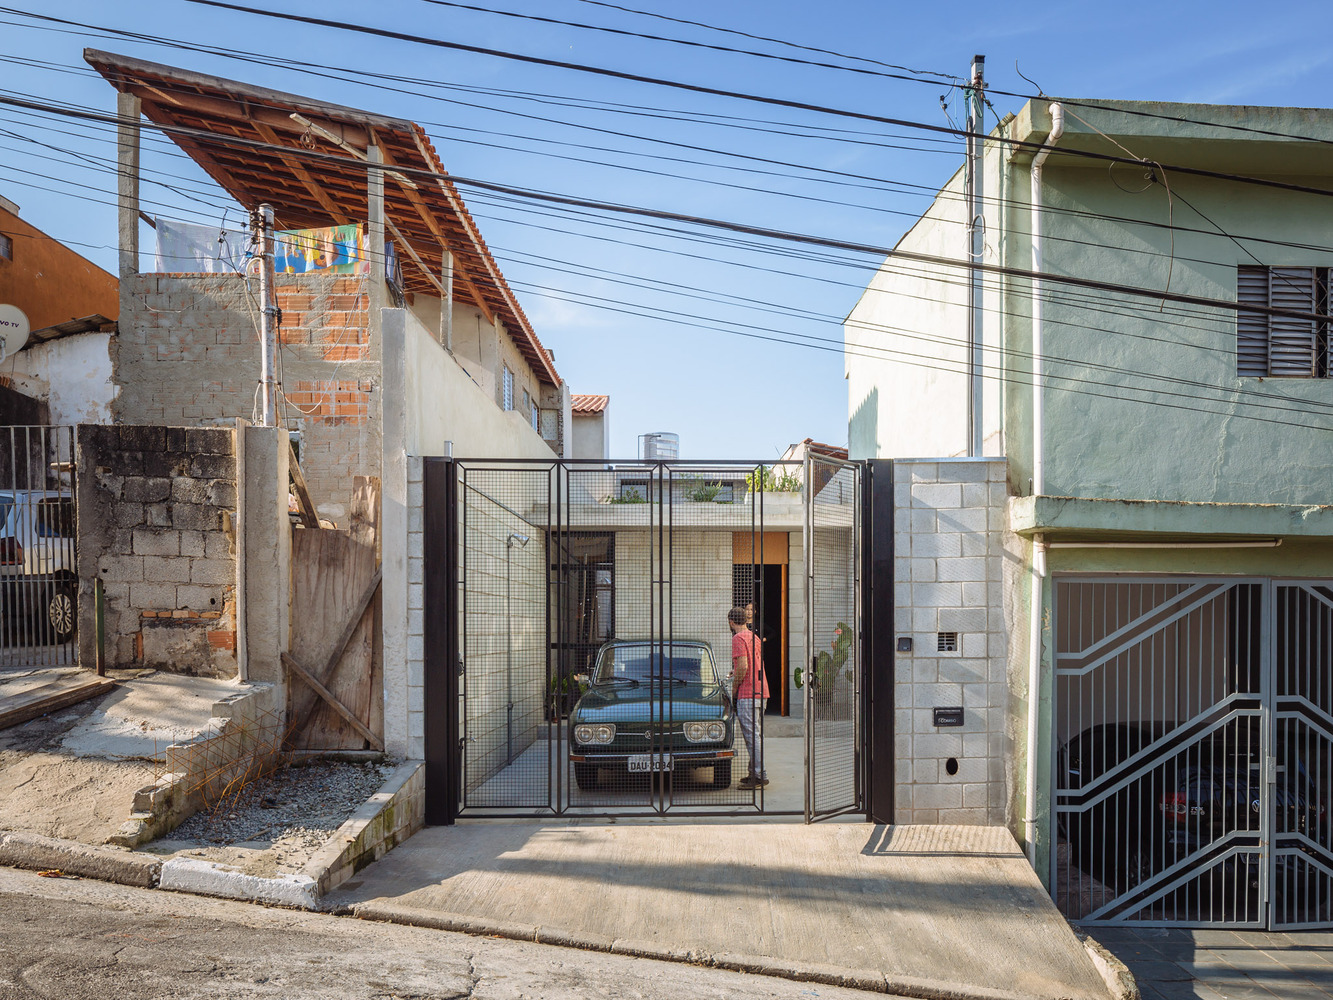 san paolo brasile casa essenziale frontiere